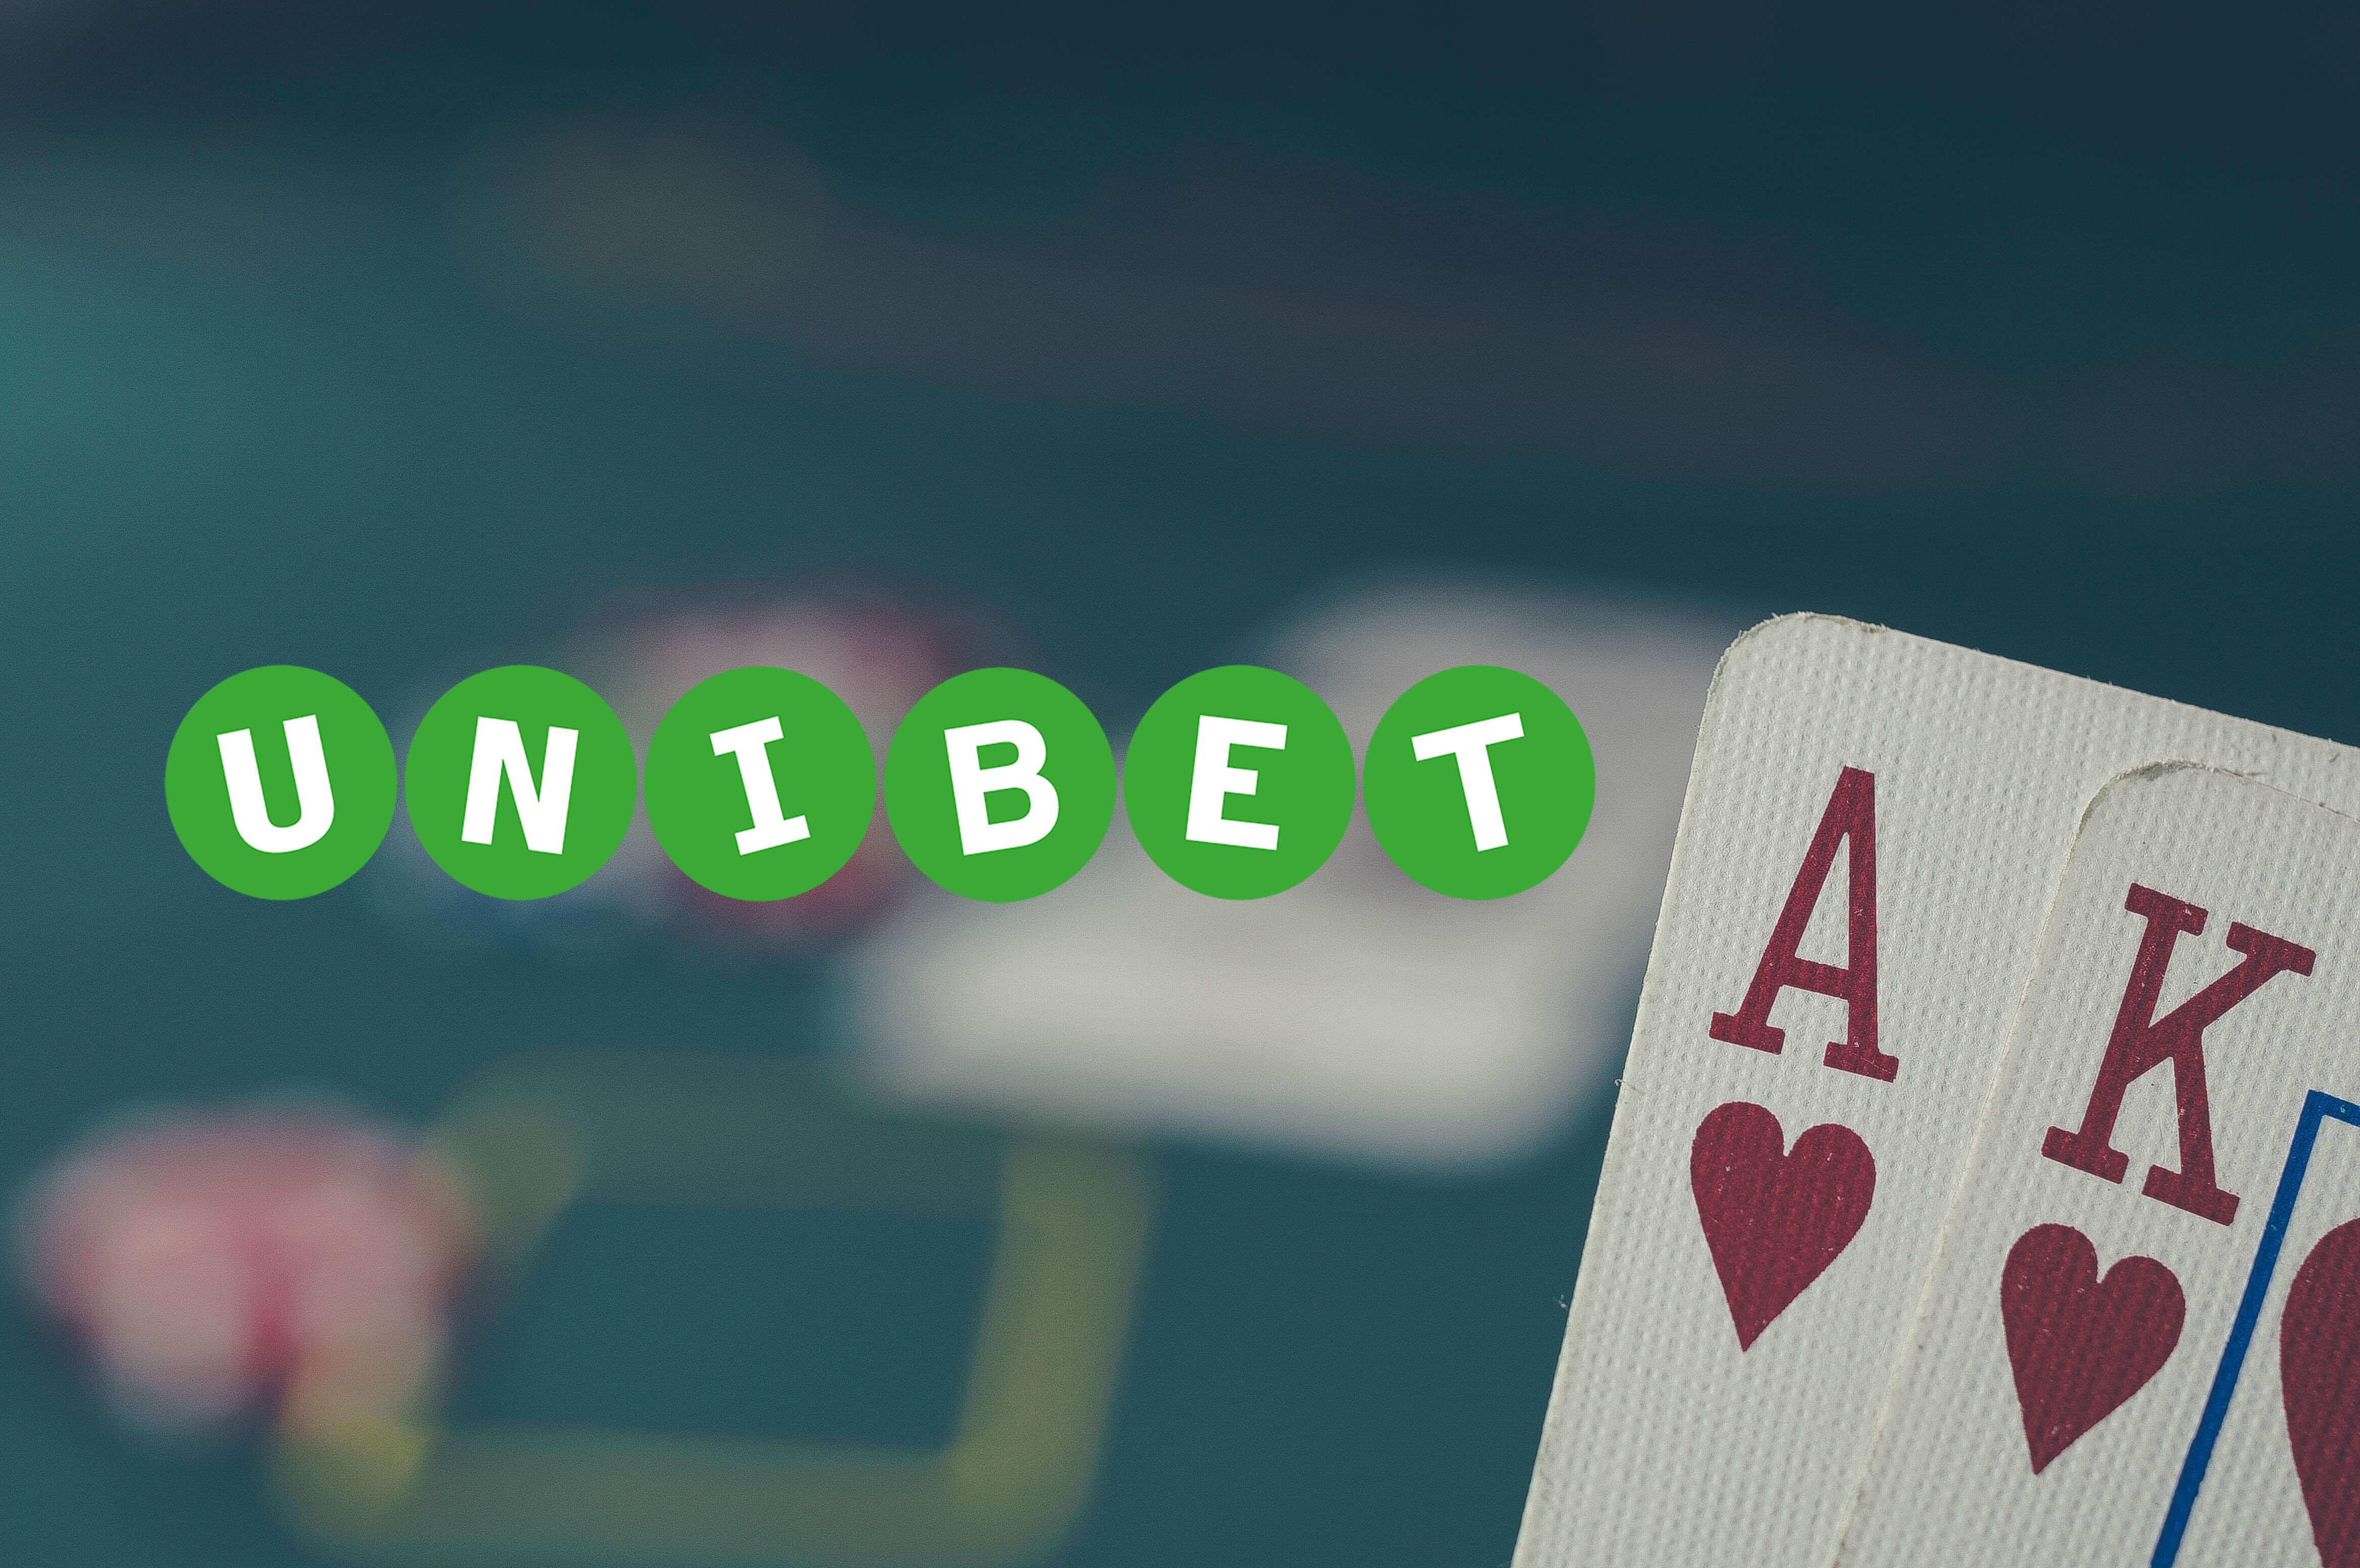 Unibet - logo